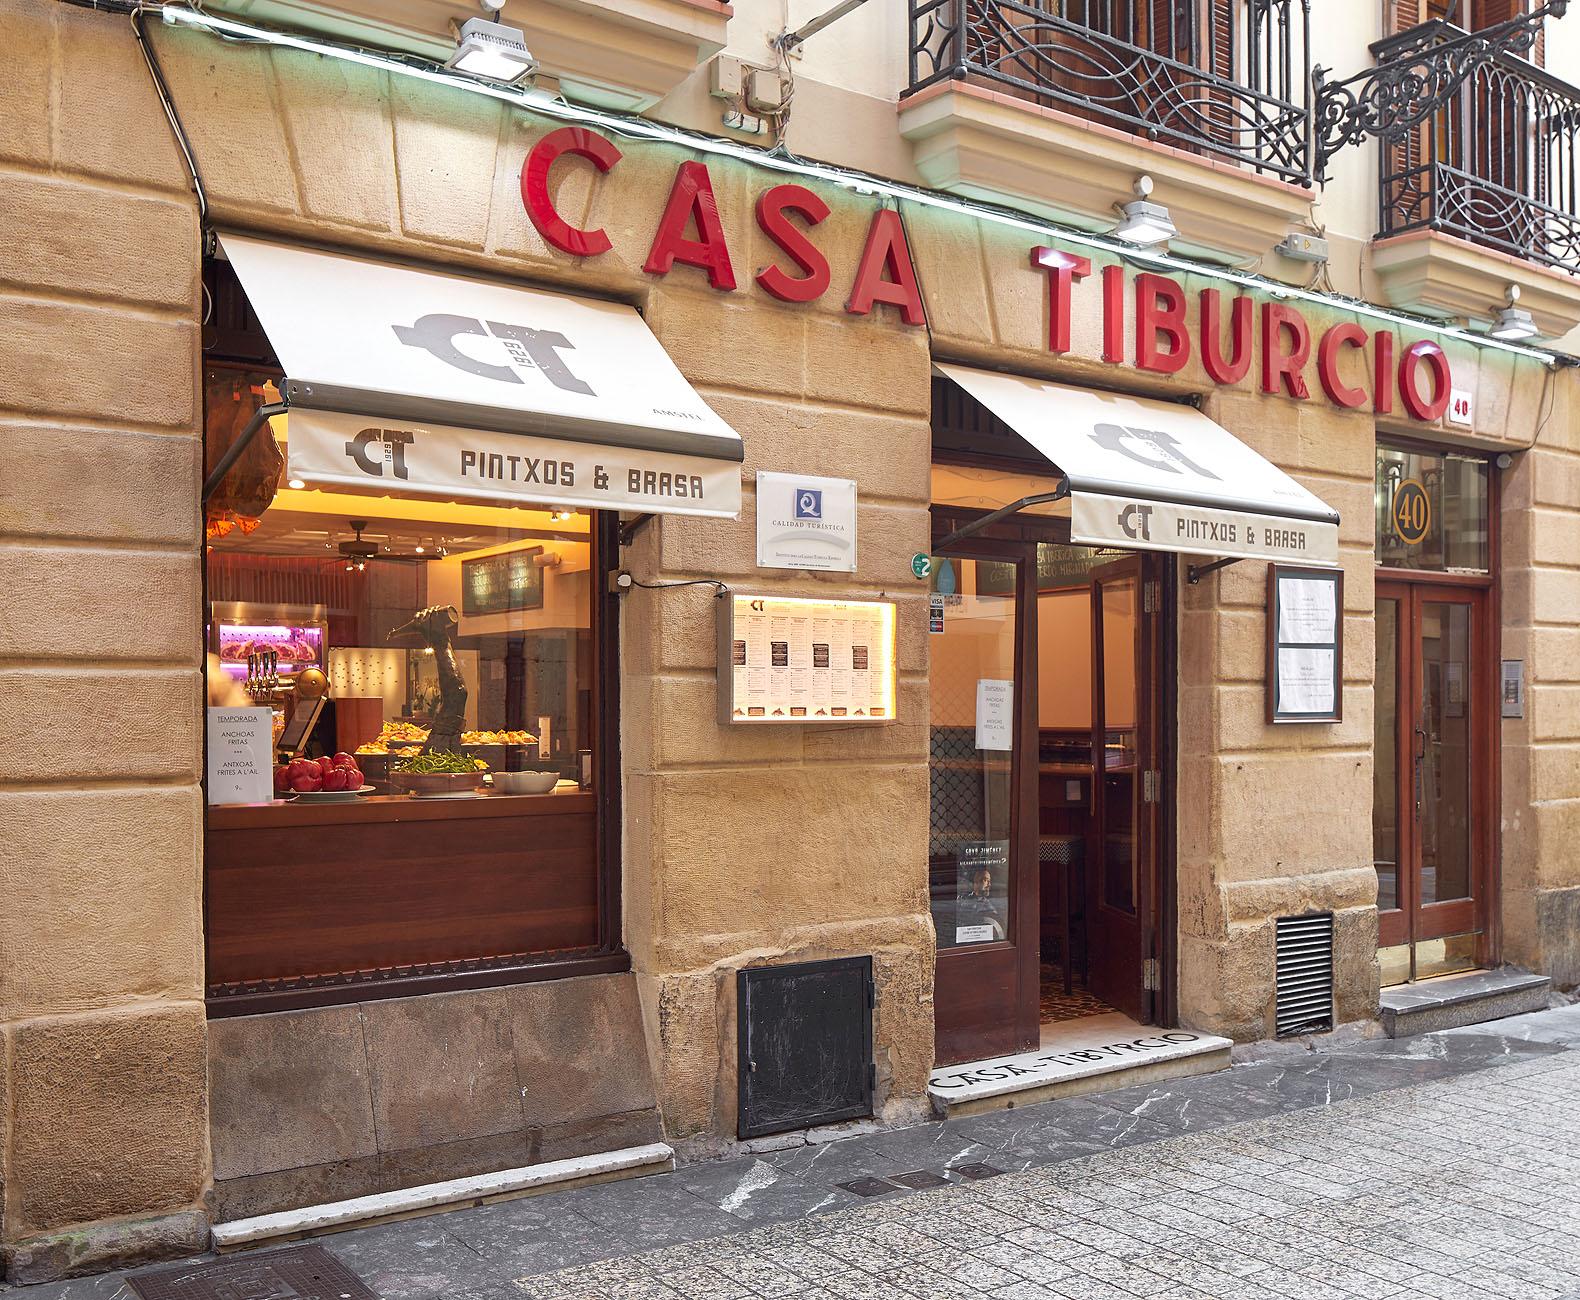 Casa Tiburcio - Iñaki Caperochipi - Fotografía